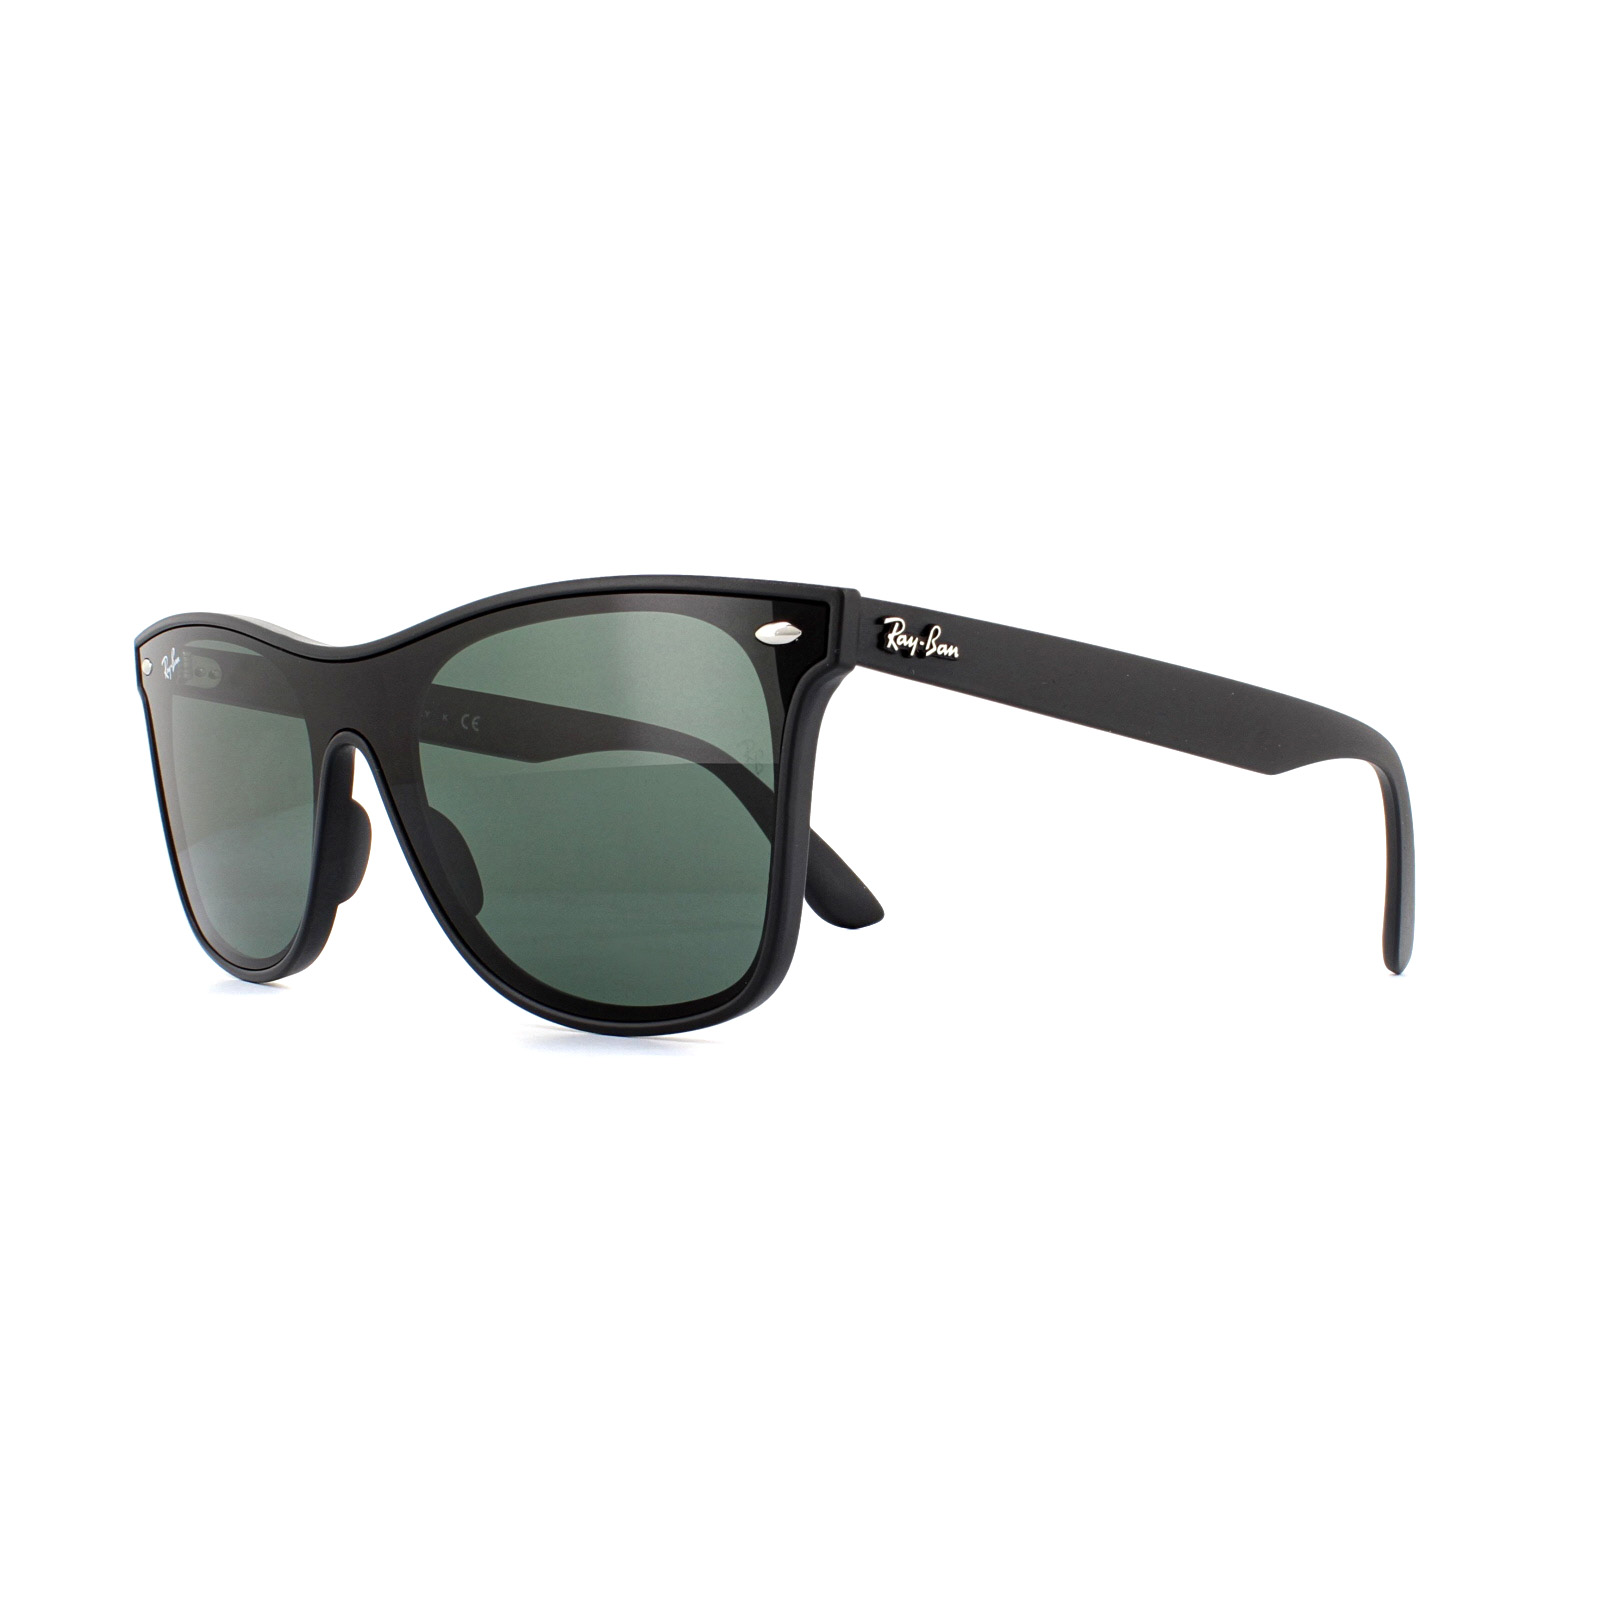 bd7b3845d8 Sentinel Ray-Ban Sunglasses Blaze Wayfarer 4440N 601 71 Black Grey Green